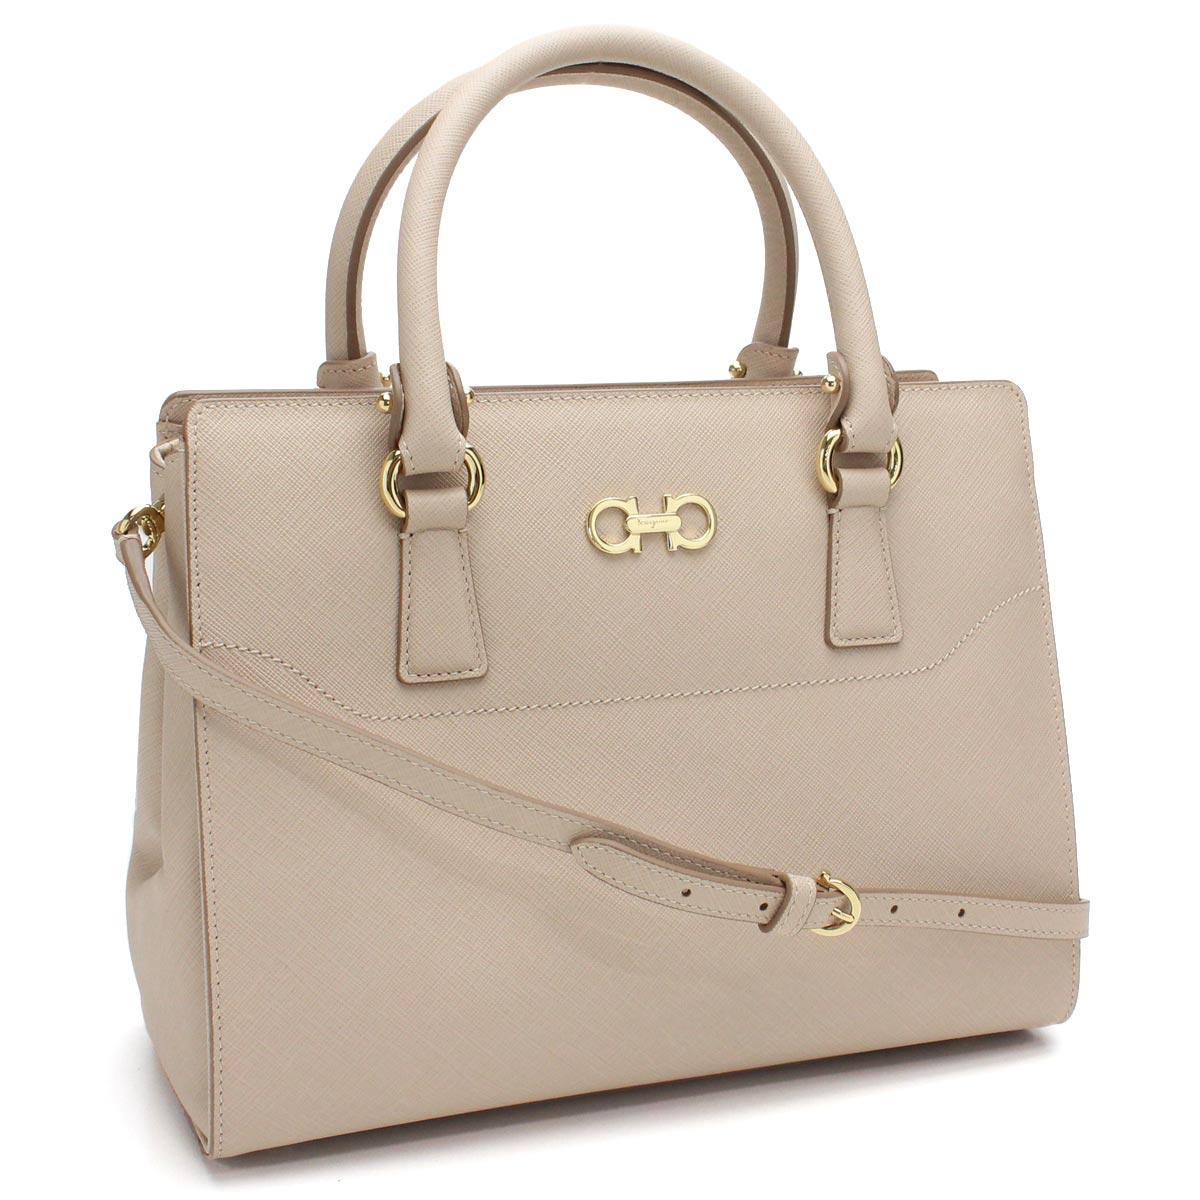 446c3b9abf8f Bighit The total brand wholesale  Ferragamo (FERRAGAMO) BEKY 2way handbag  21-F317 0622260 NEW BISQUE beige system